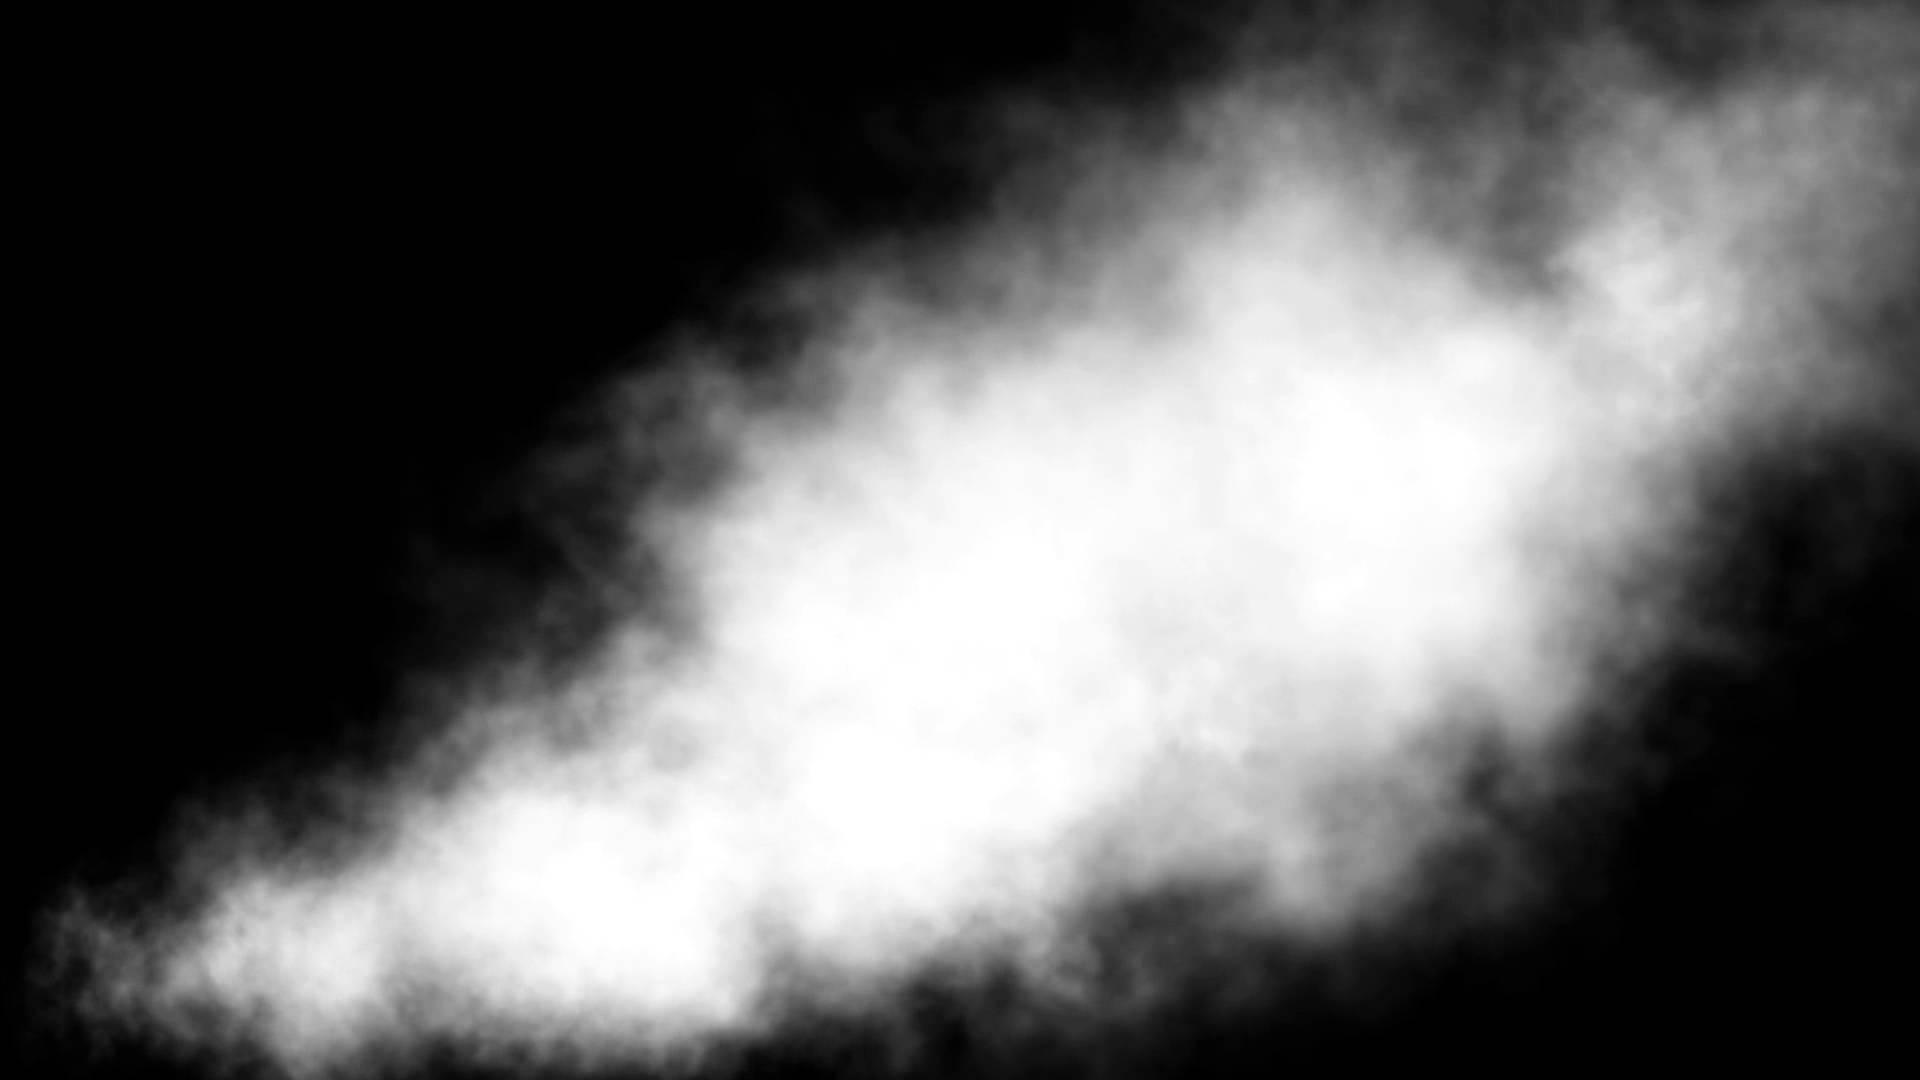 Big White Smoke Wind 2 Black Background ANIMATION FREE FOOTAGE HD 1920x1080